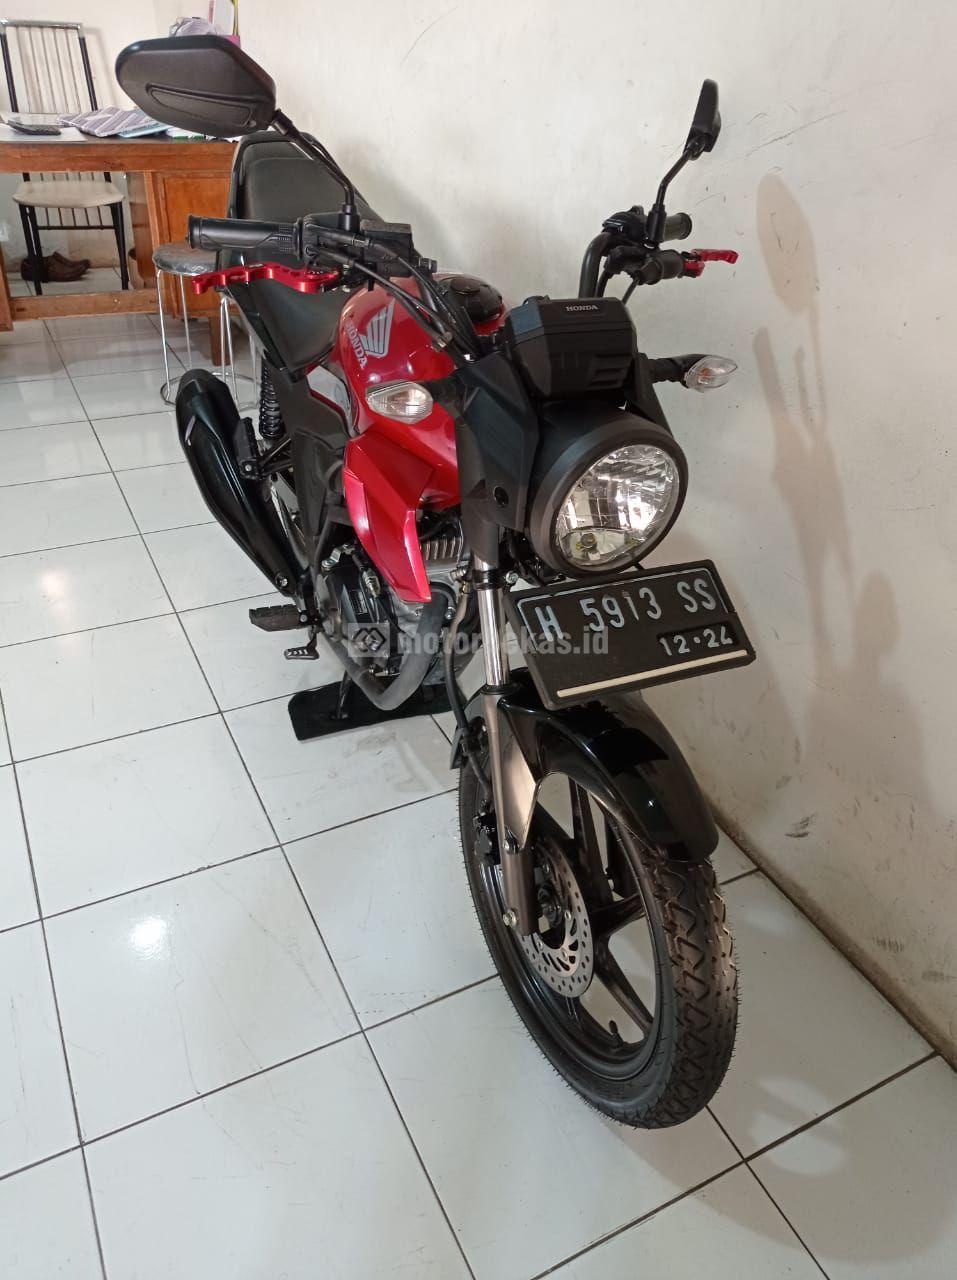 HONDA CB VERZA  1130 motorbekas.id